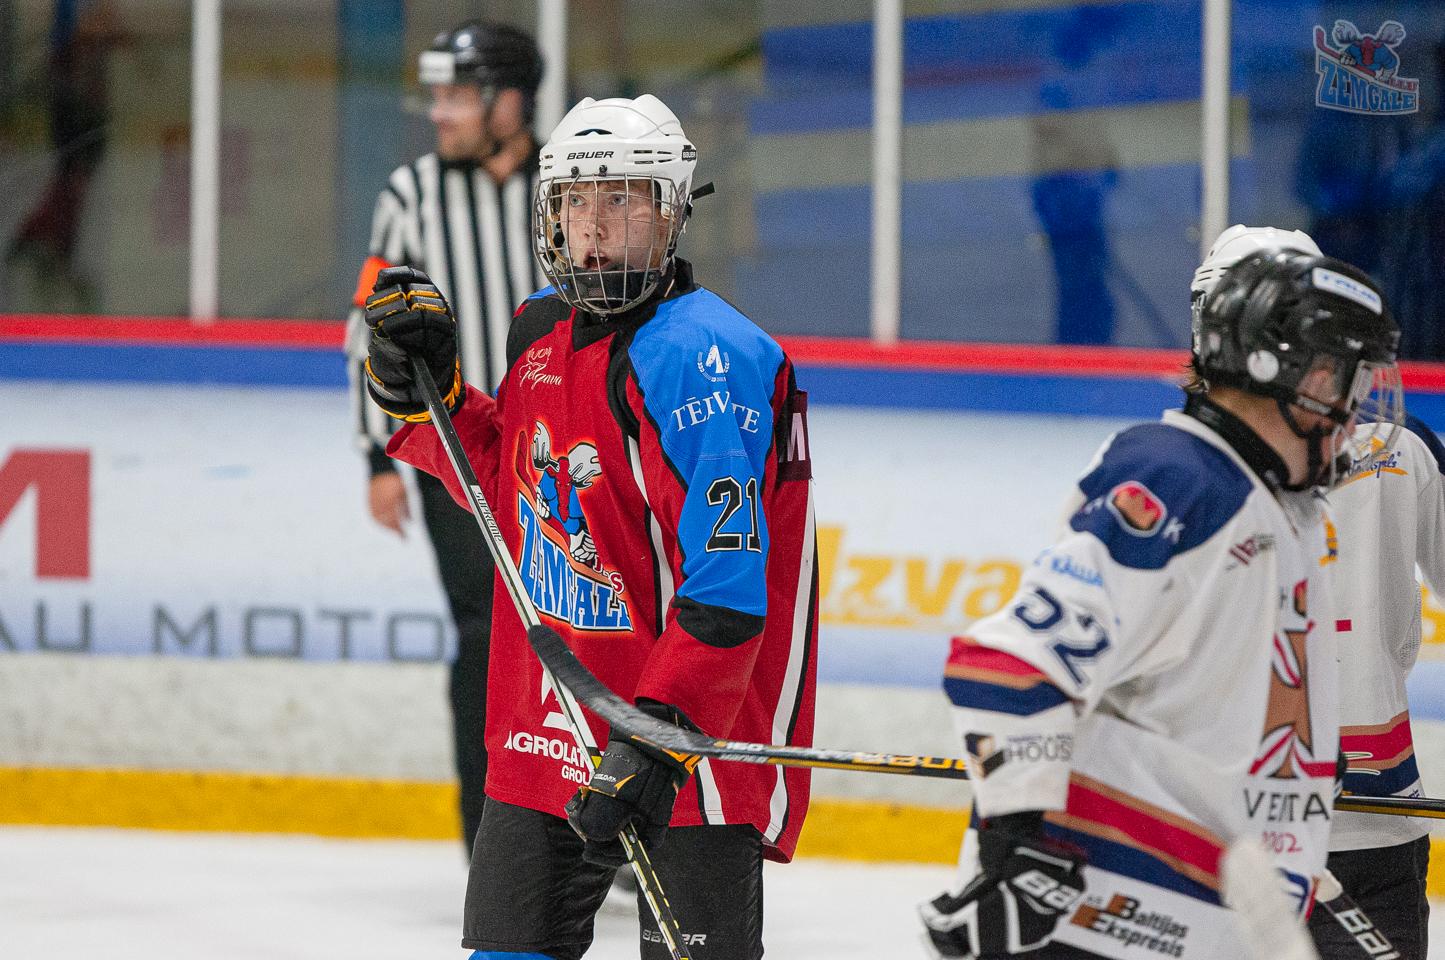 Jelgavas hokeja skola JLSS U17 - Venta 2002 14092019-21